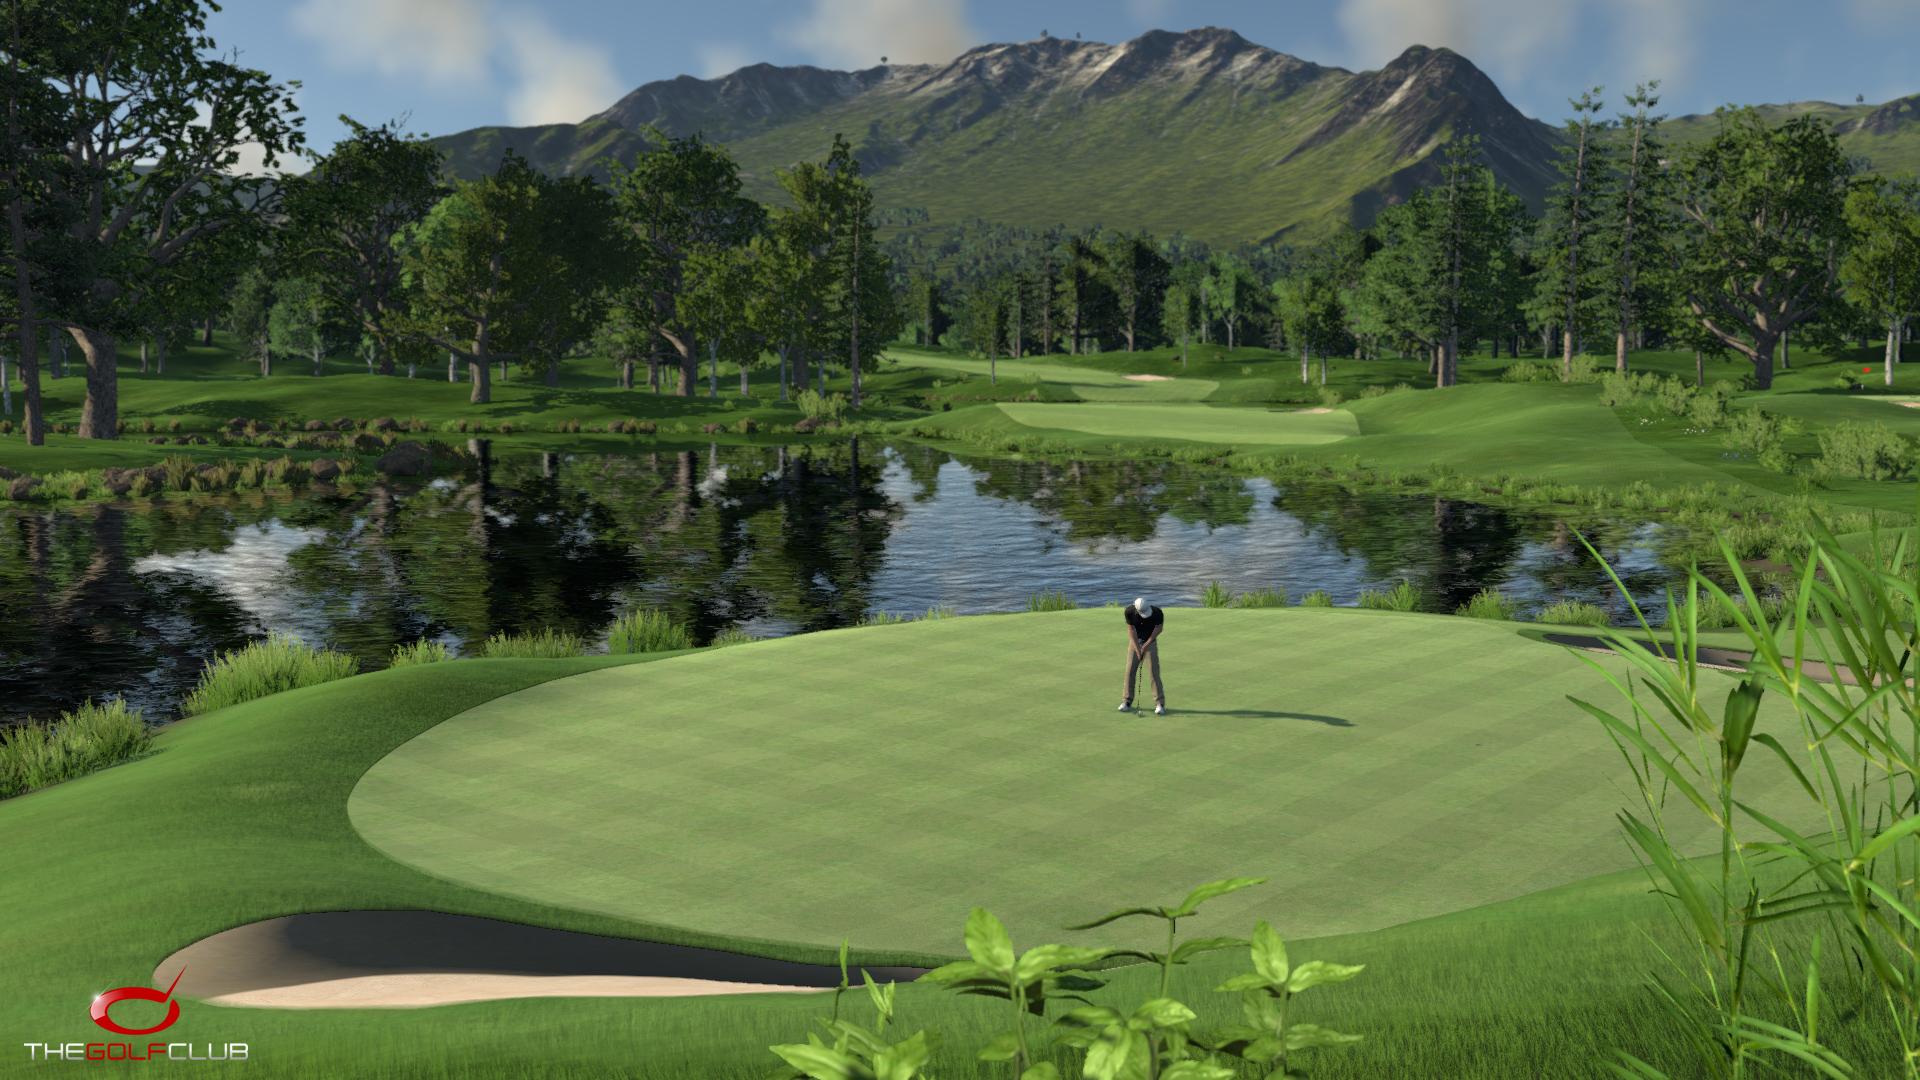 The Golf Club Wallpaper 02 19201080 1920x1080